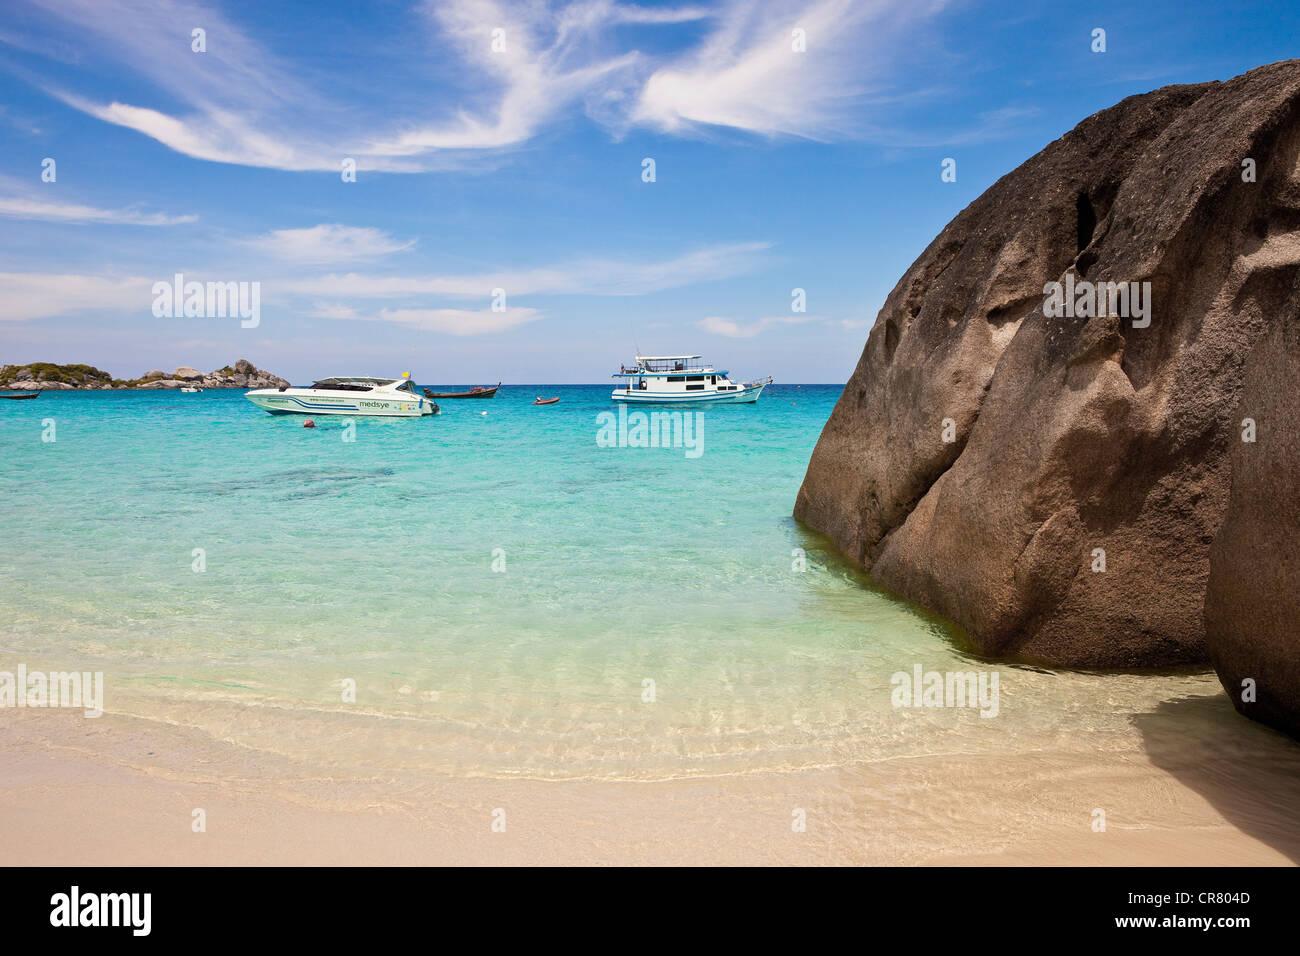 Thailand, North to the Andaman Coast, Similan National Marine Park, island n°8 - Stock Image